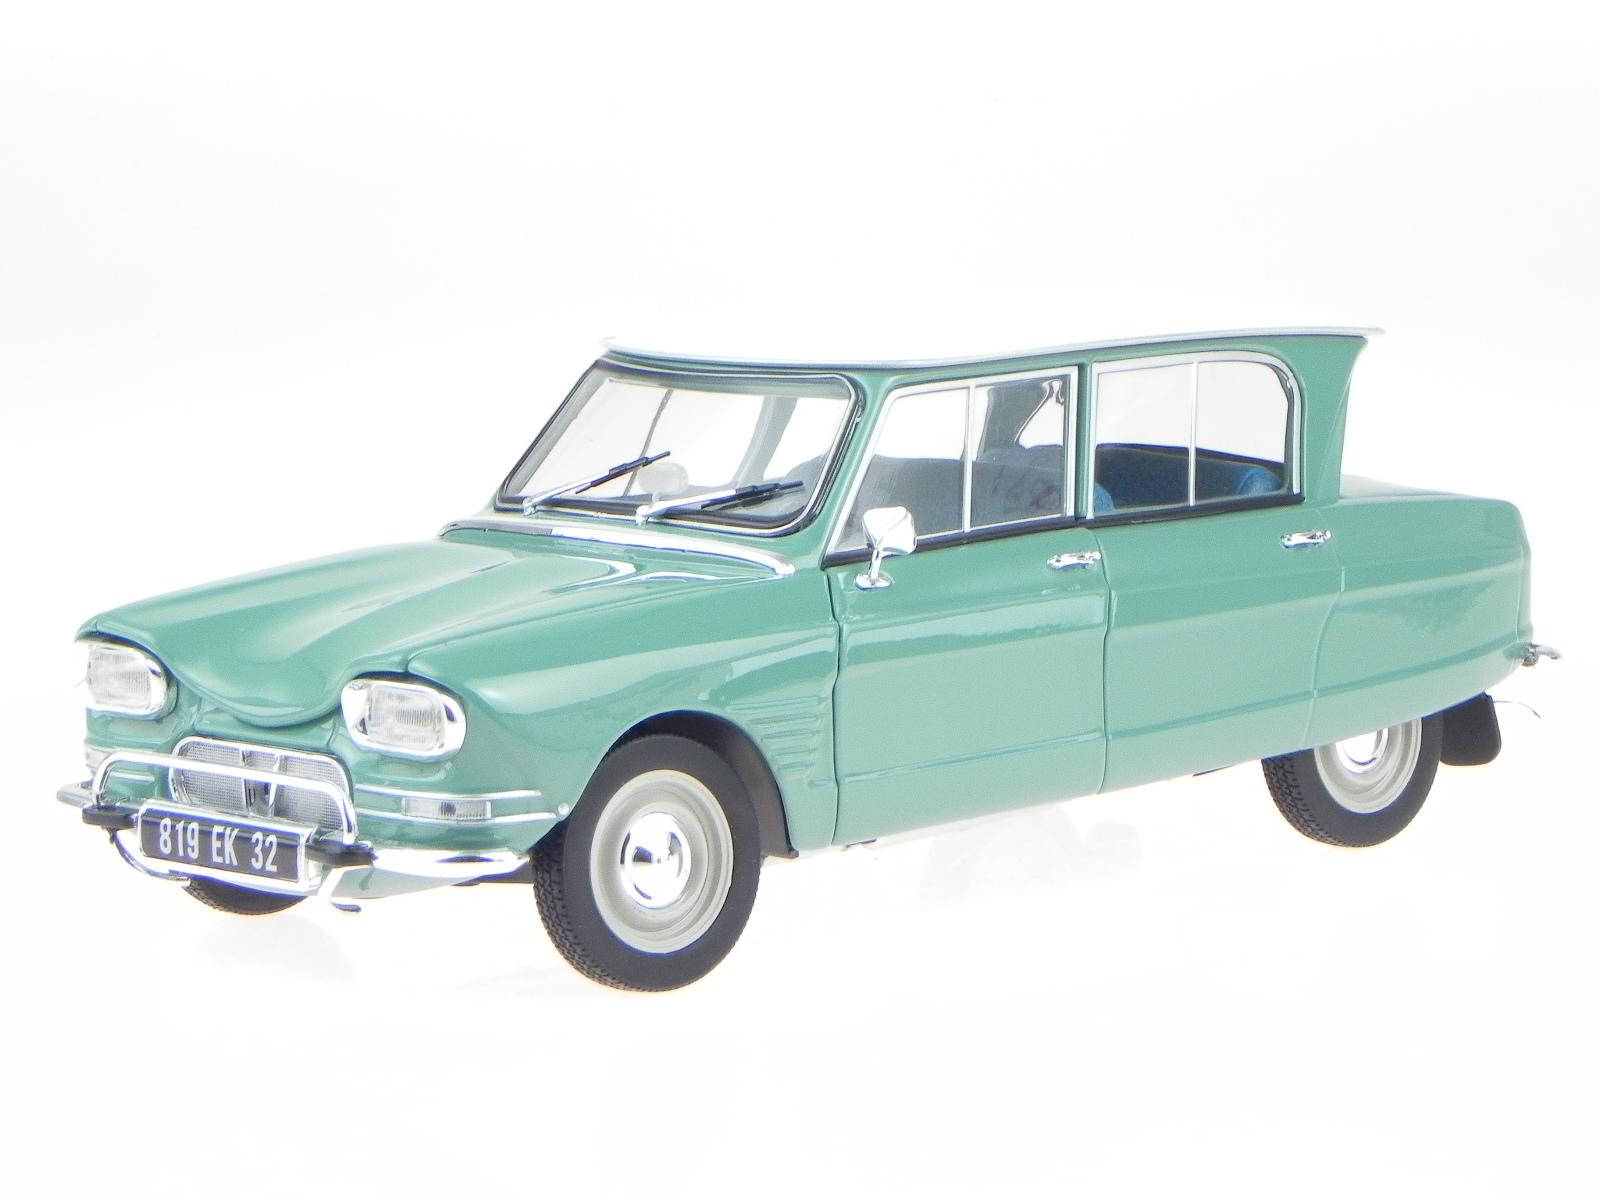 citroen ami 6 1964 jade green modelcar 181536 norev 1 18. Black Bedroom Furniture Sets. Home Design Ideas